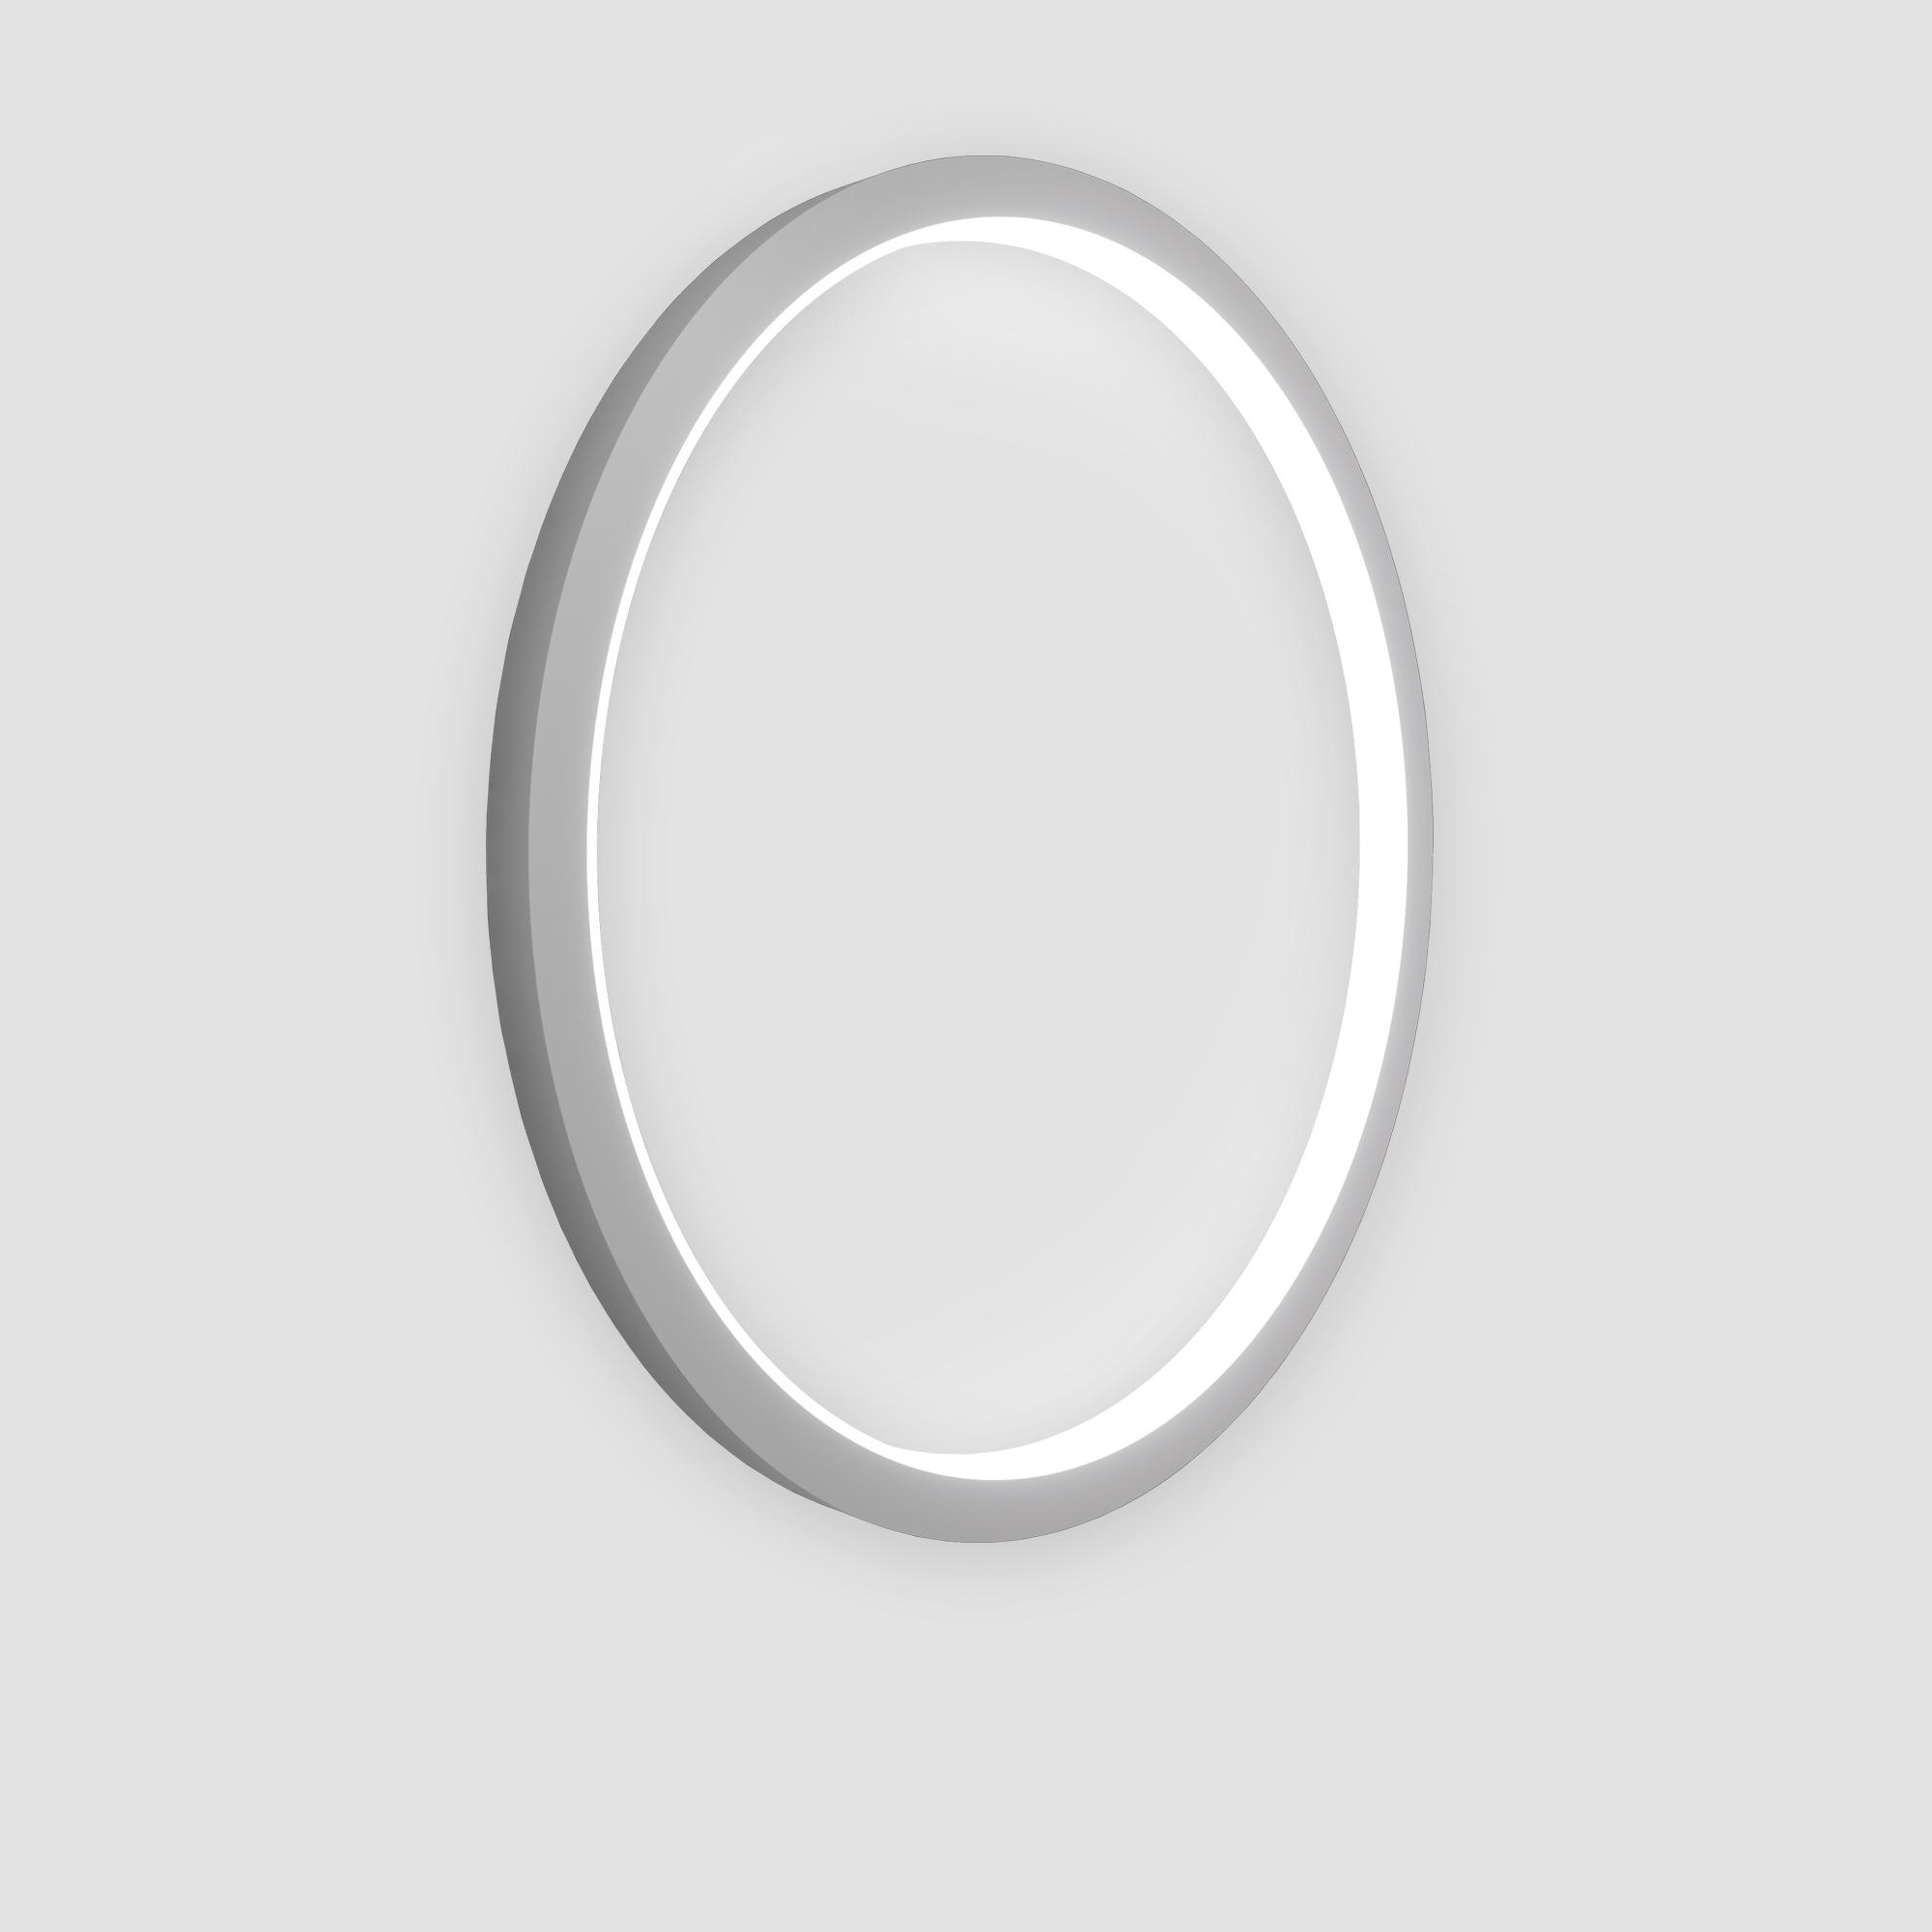 Micro Ring SE™